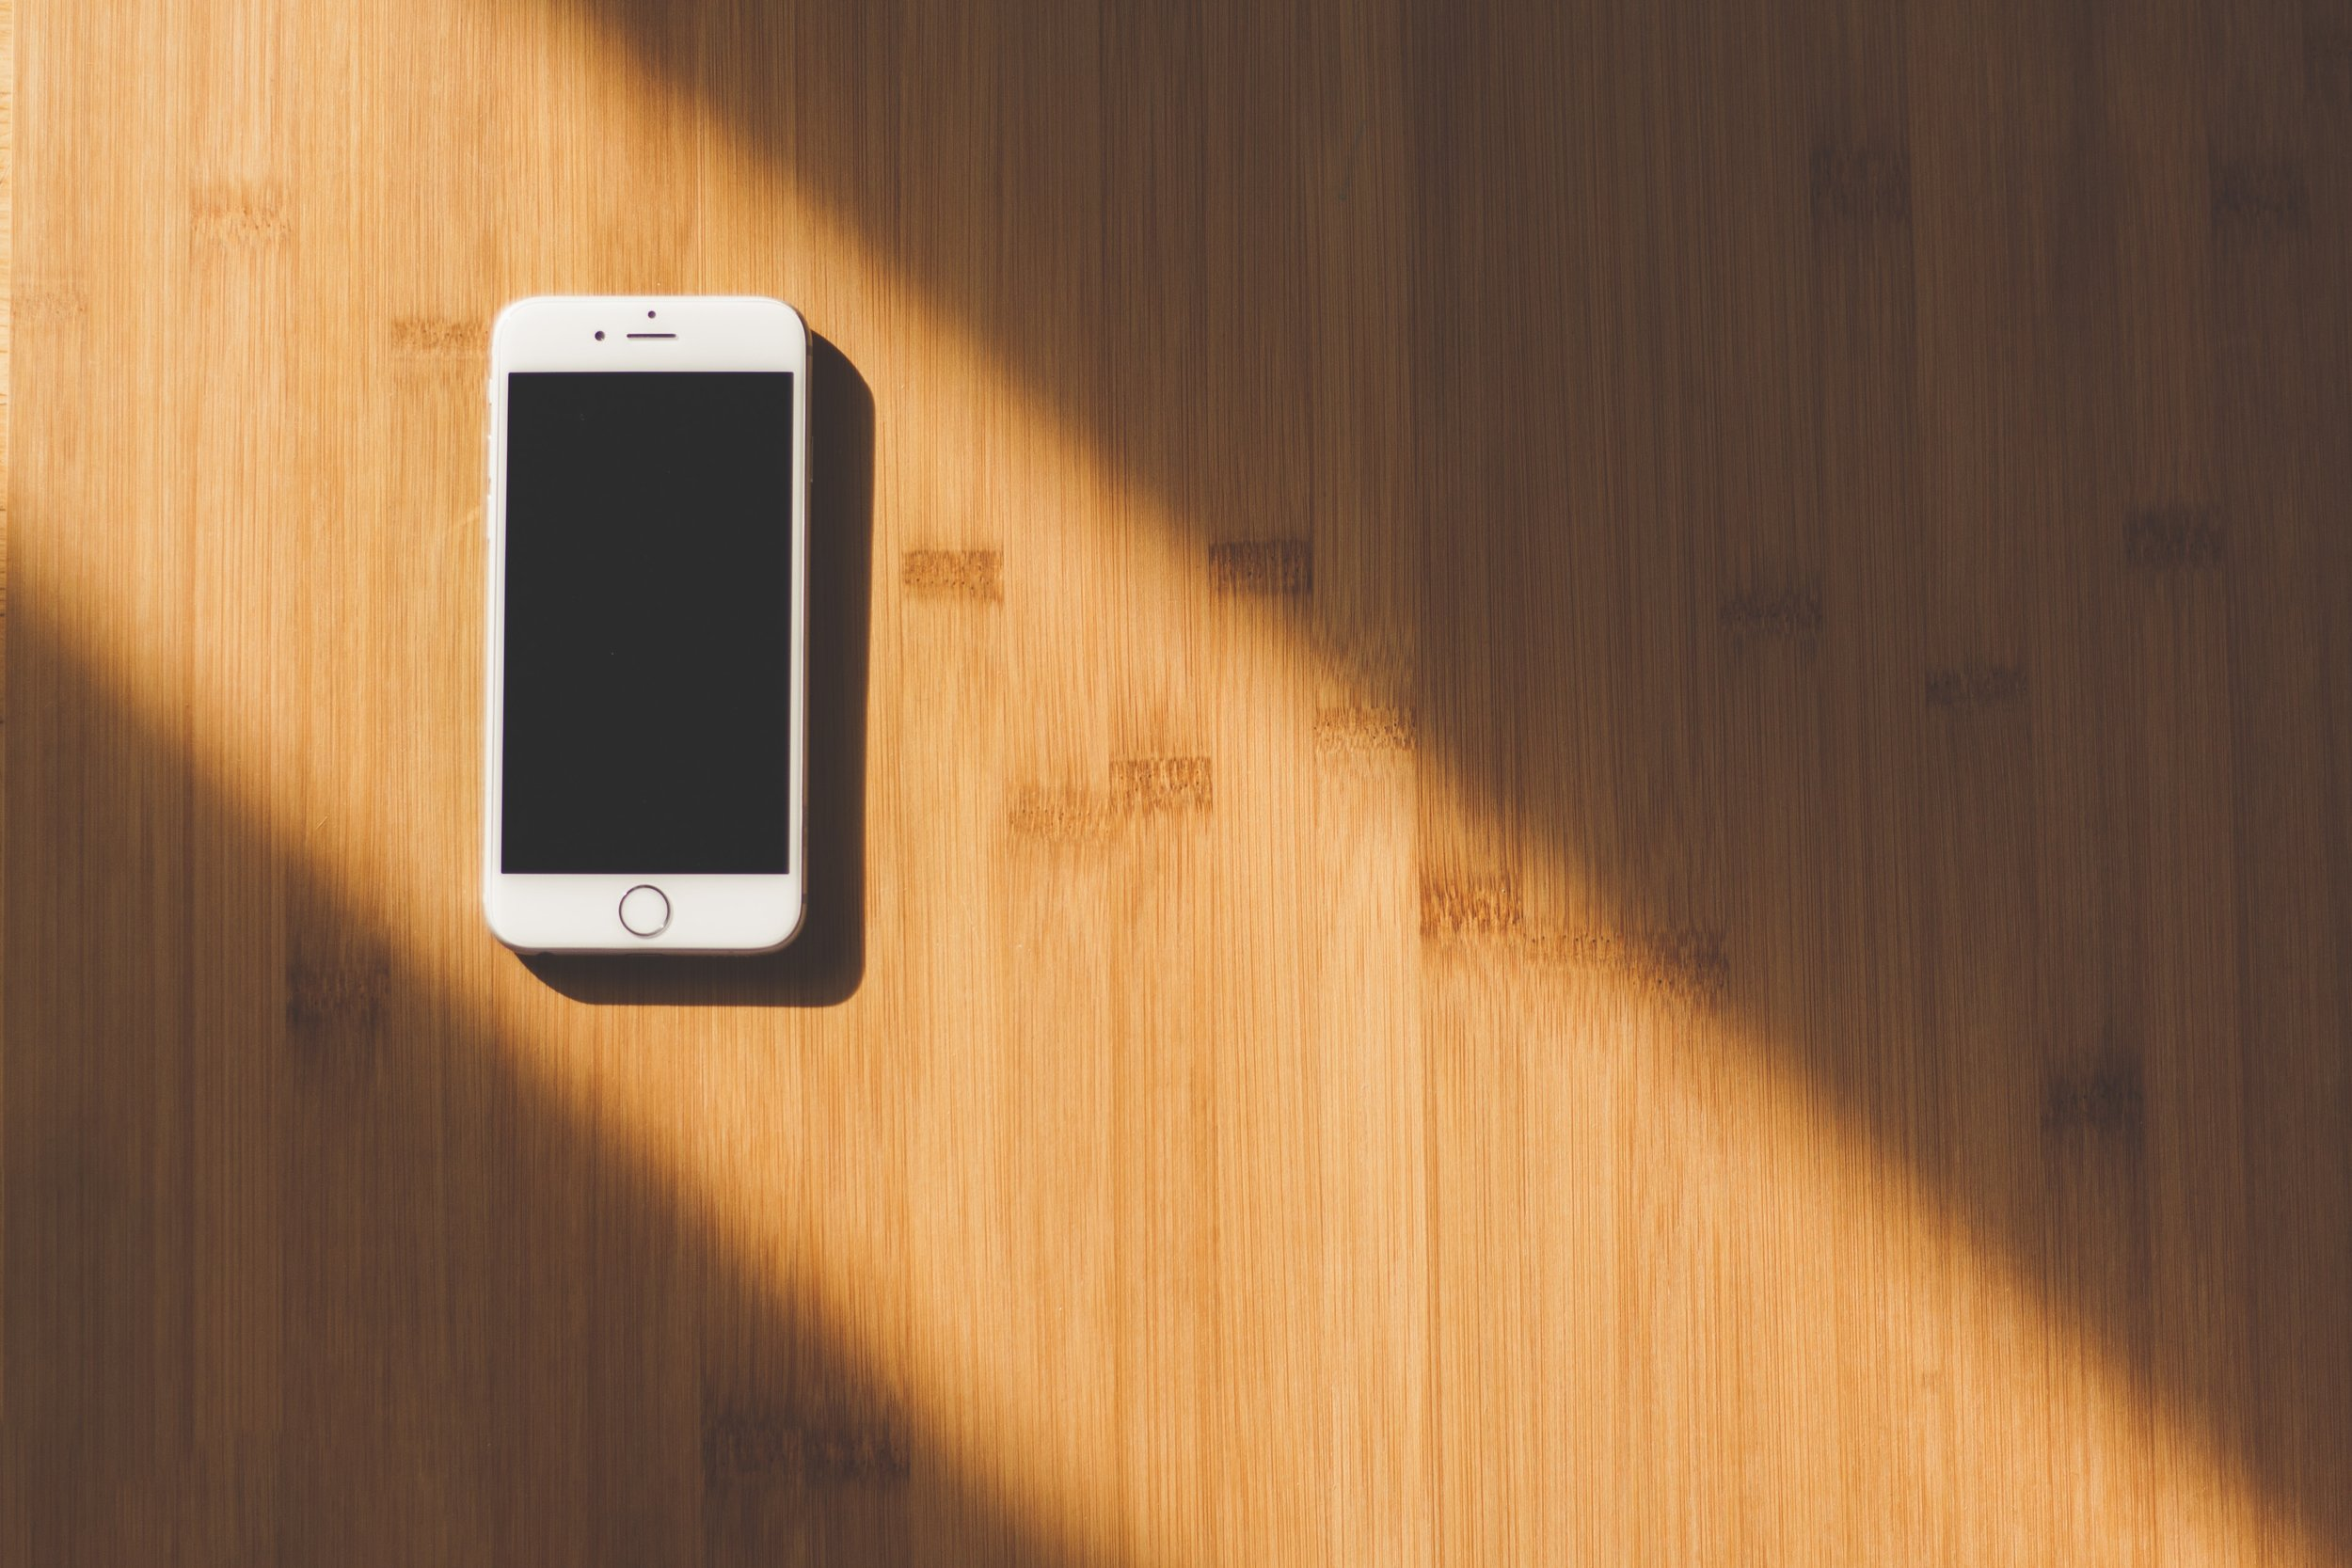 iphone-mobile-mobile-phone-48605.jpg